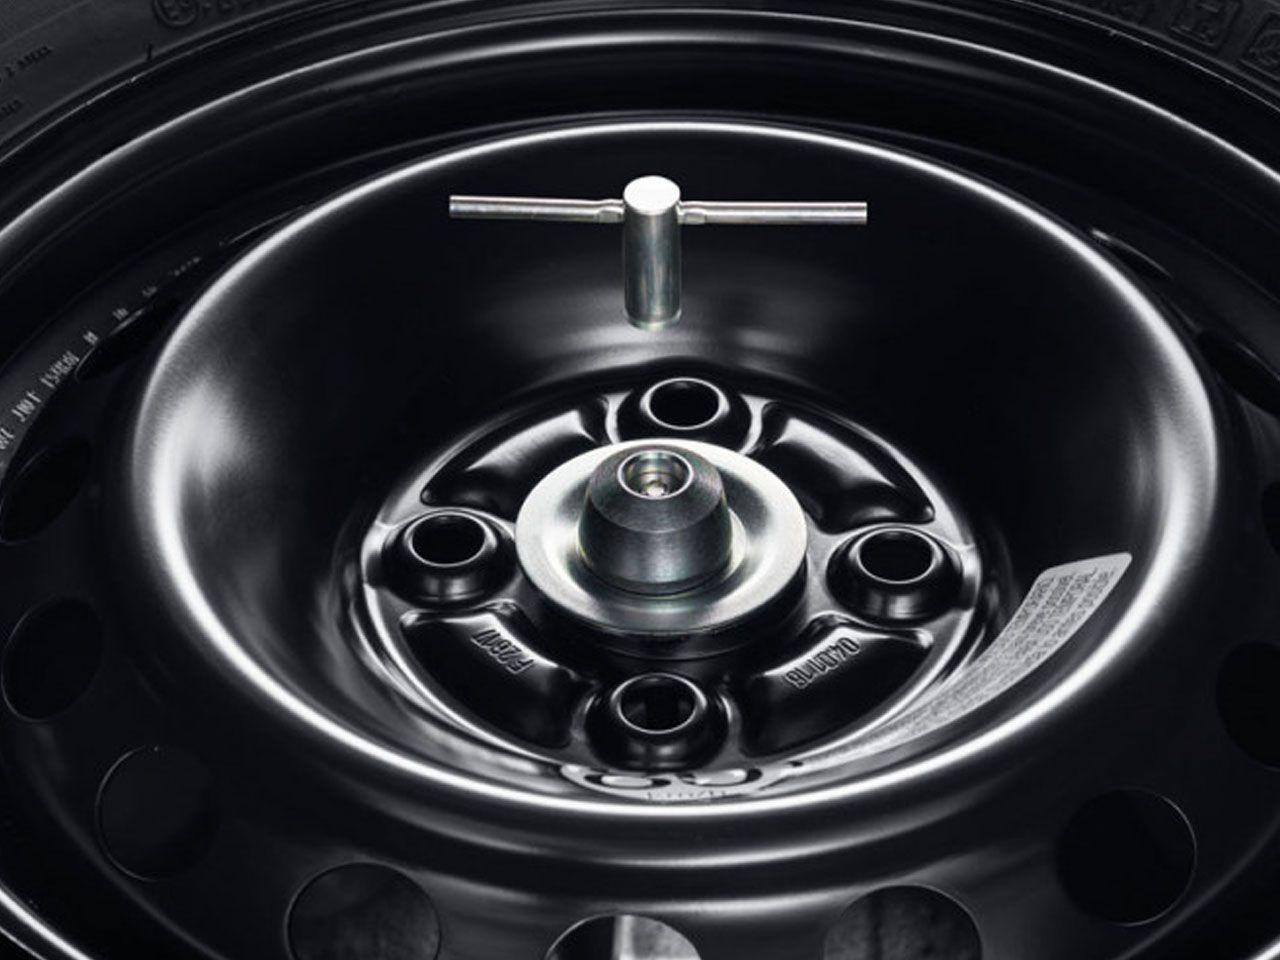 Trava de Segurança do Estepe Yaris Sedã XL XS XLS  - Mirai Peças Toyota